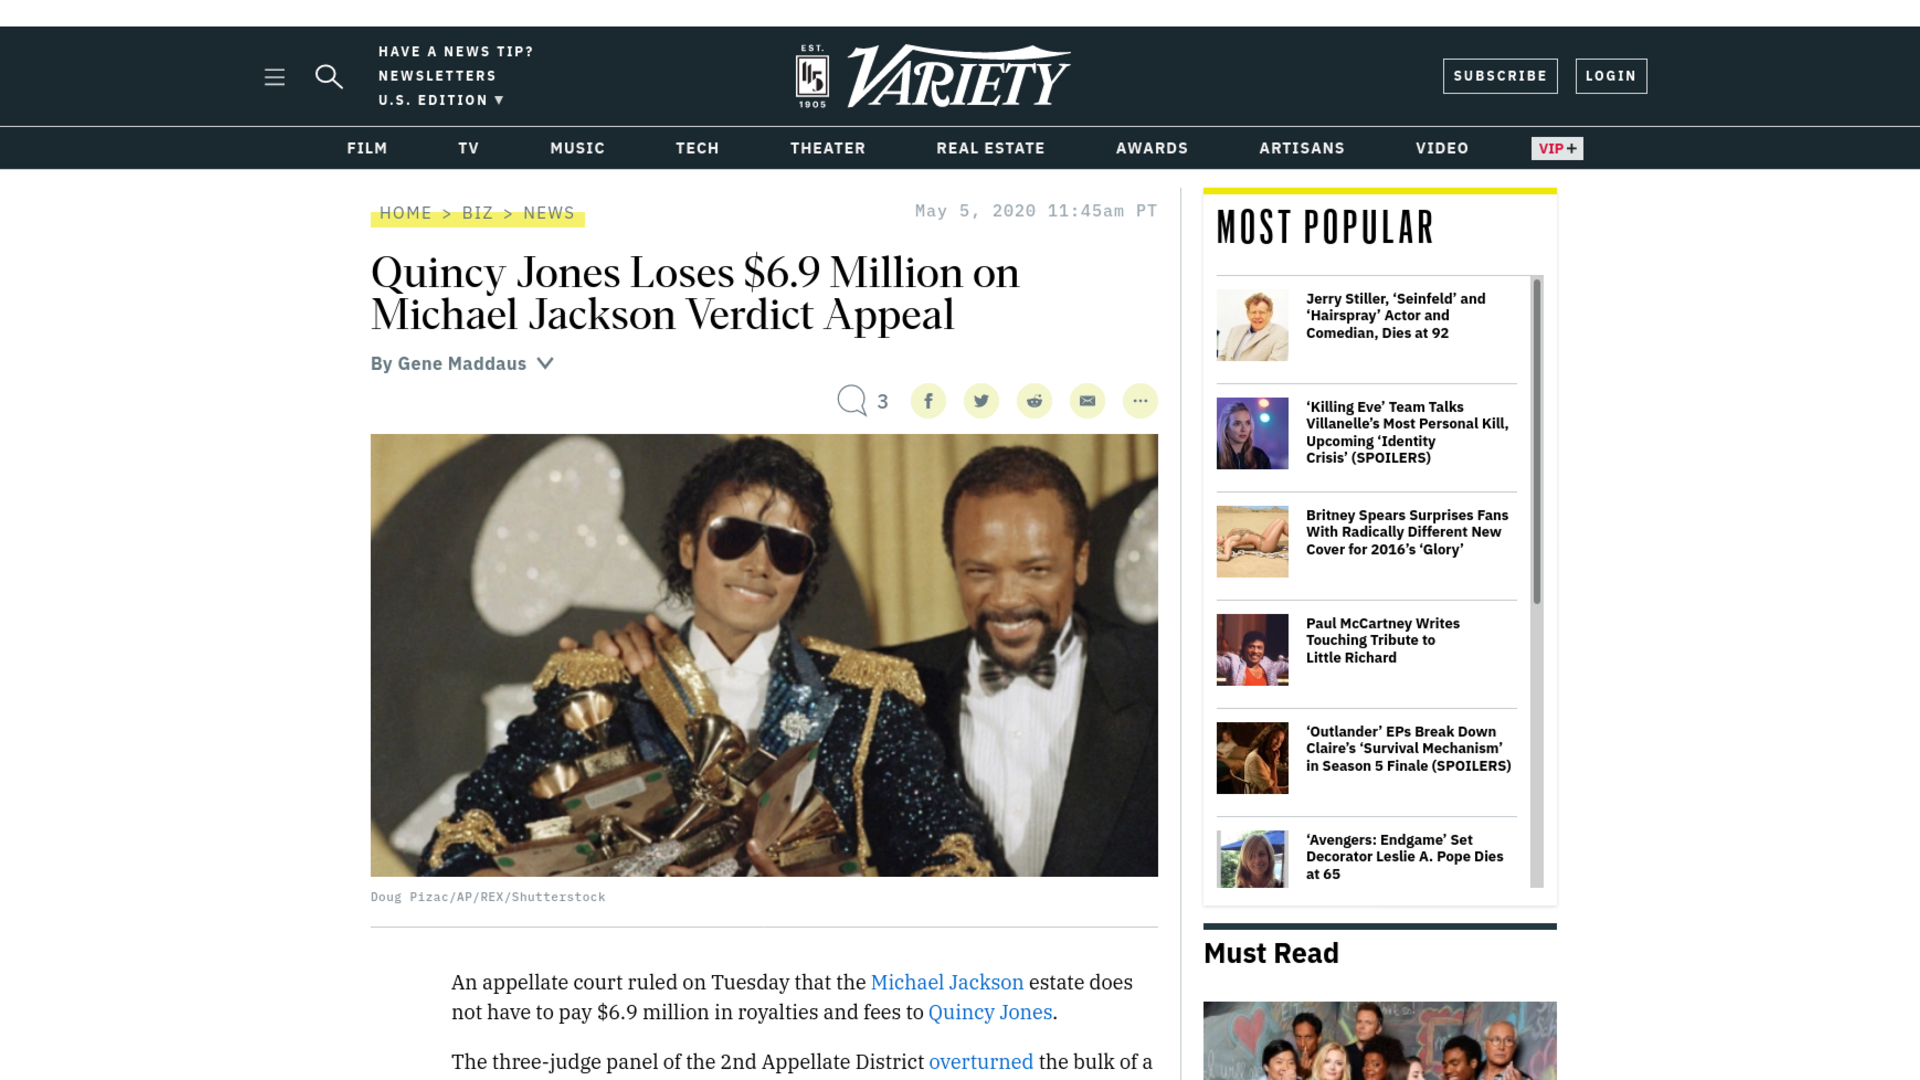 Fairness Rocks News Quincy Jones Loses $6.9 Million on Michael Jackson Verdict Appeal